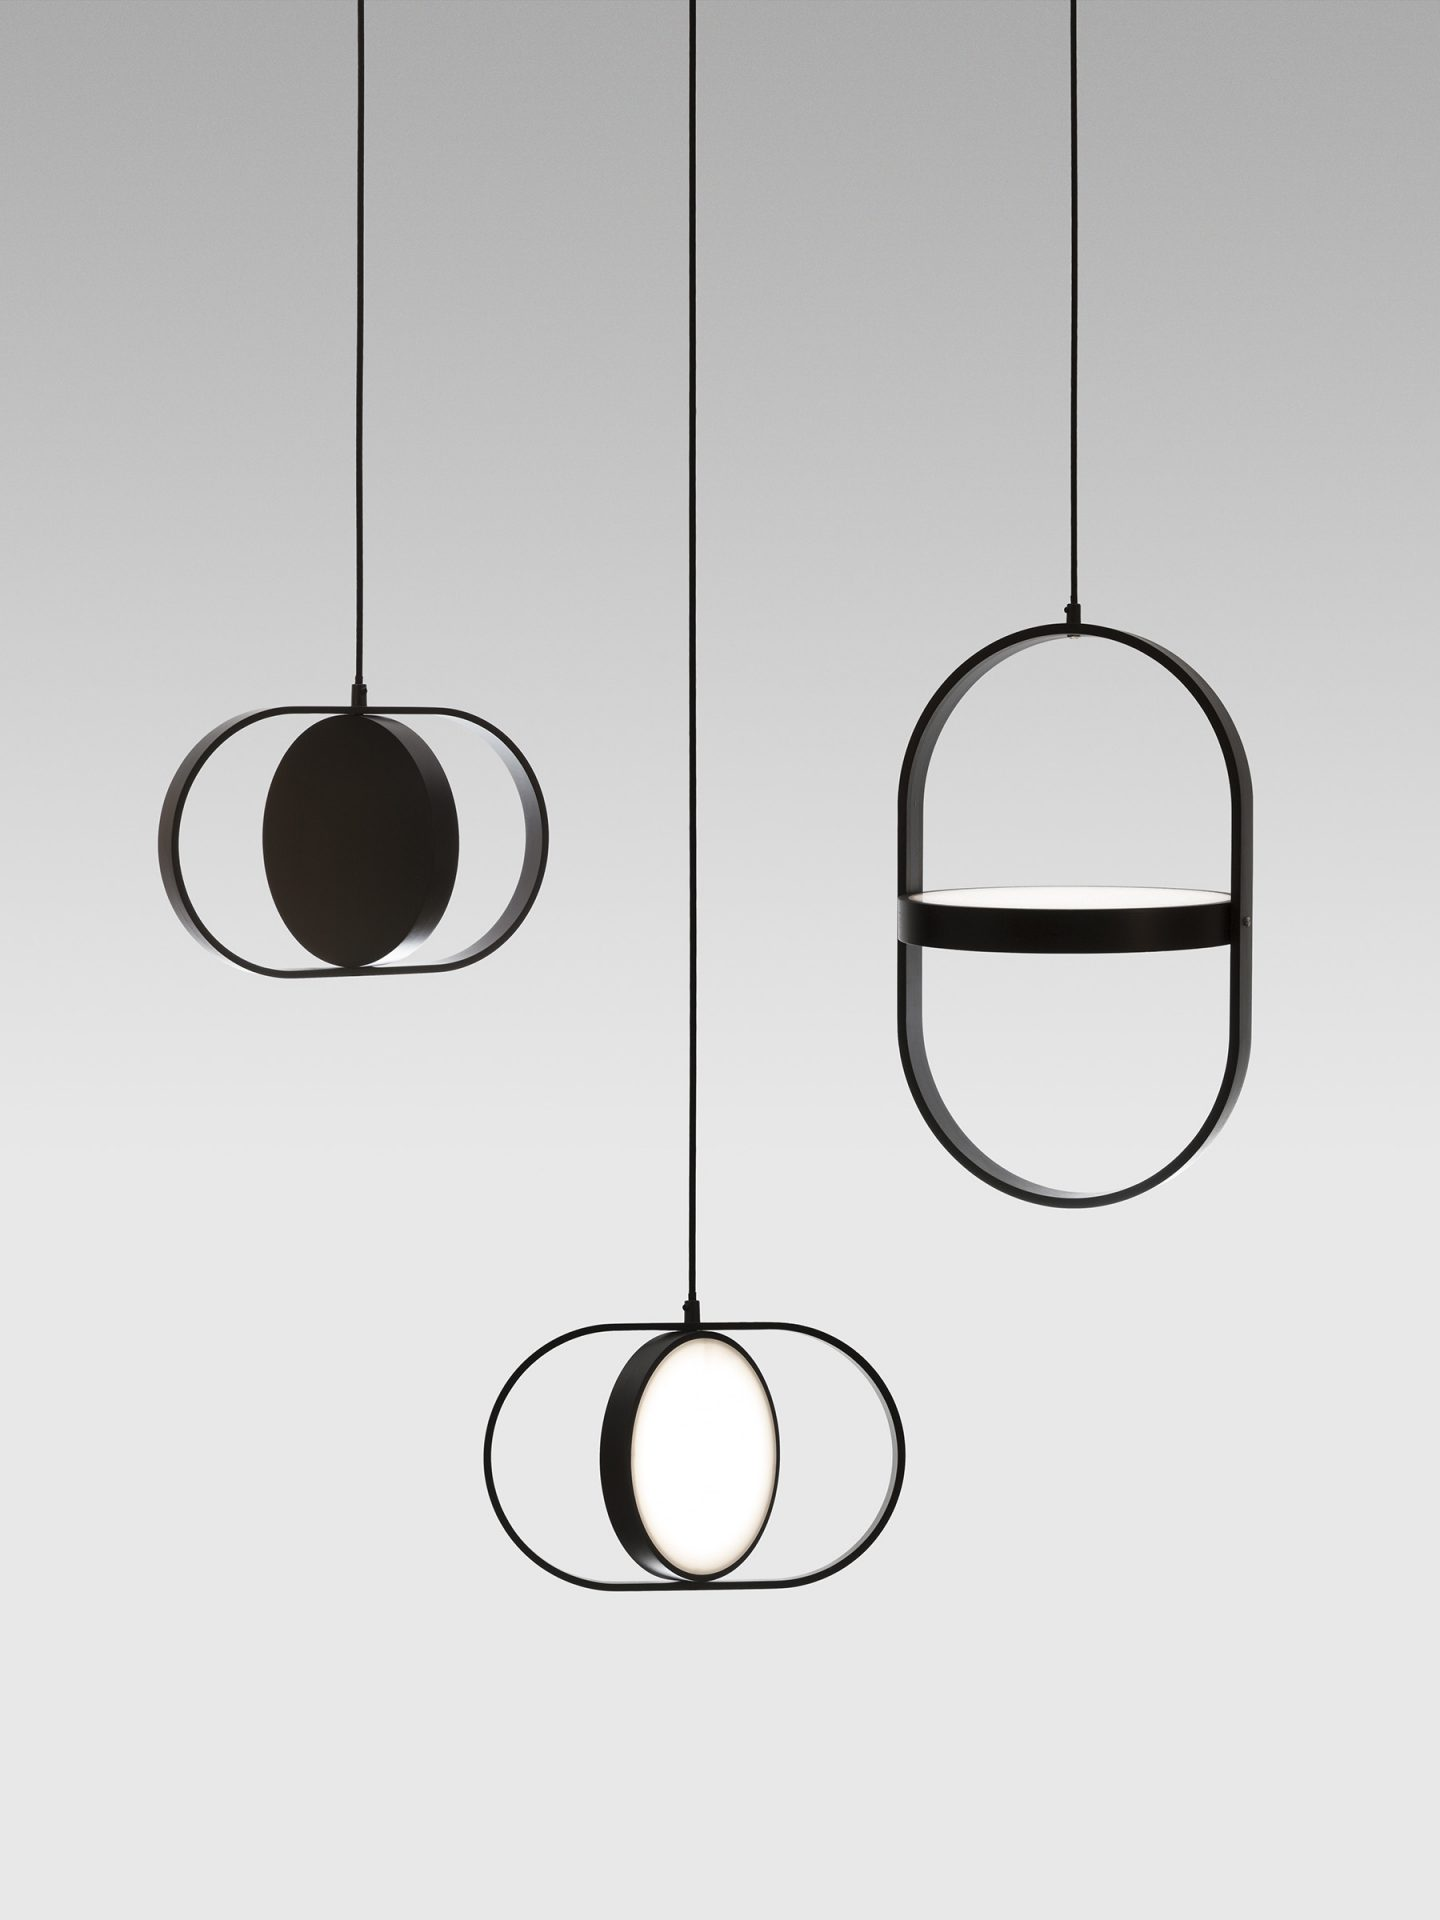 iGNANT-Design-Elina-Ulvio-KUU-02